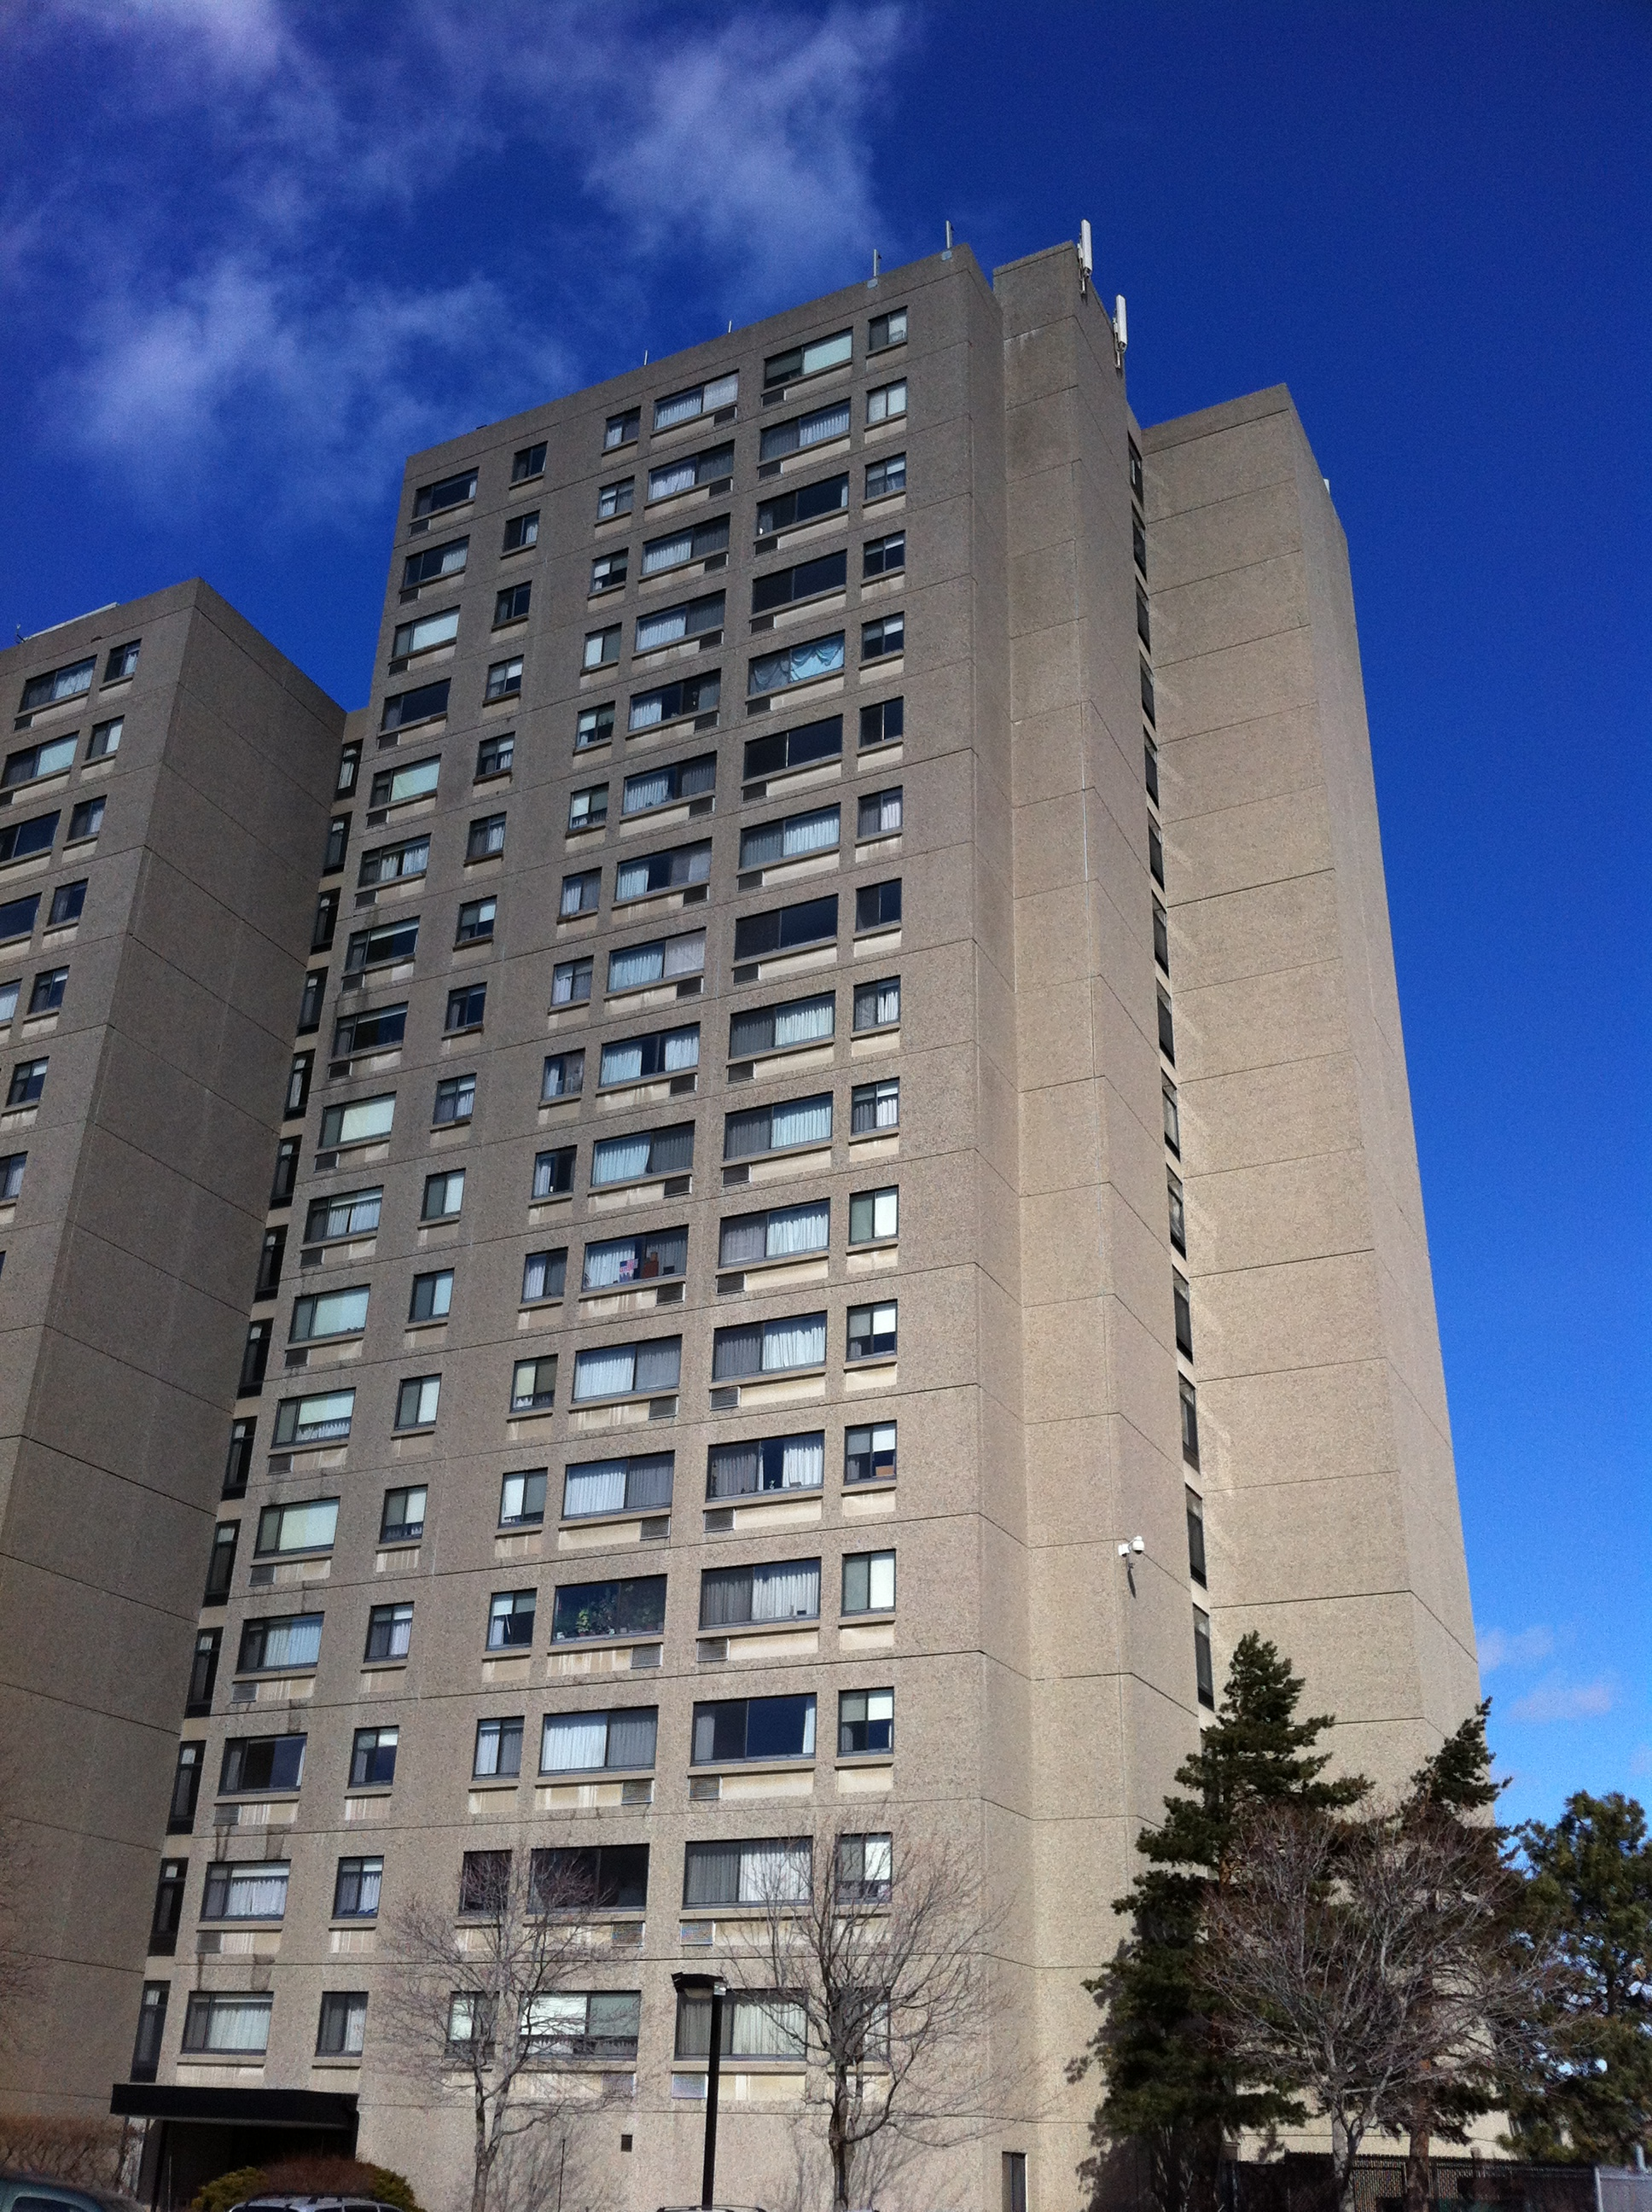 Pinnacle Apartments | HUD.gov / U.S. Department of Housing ...